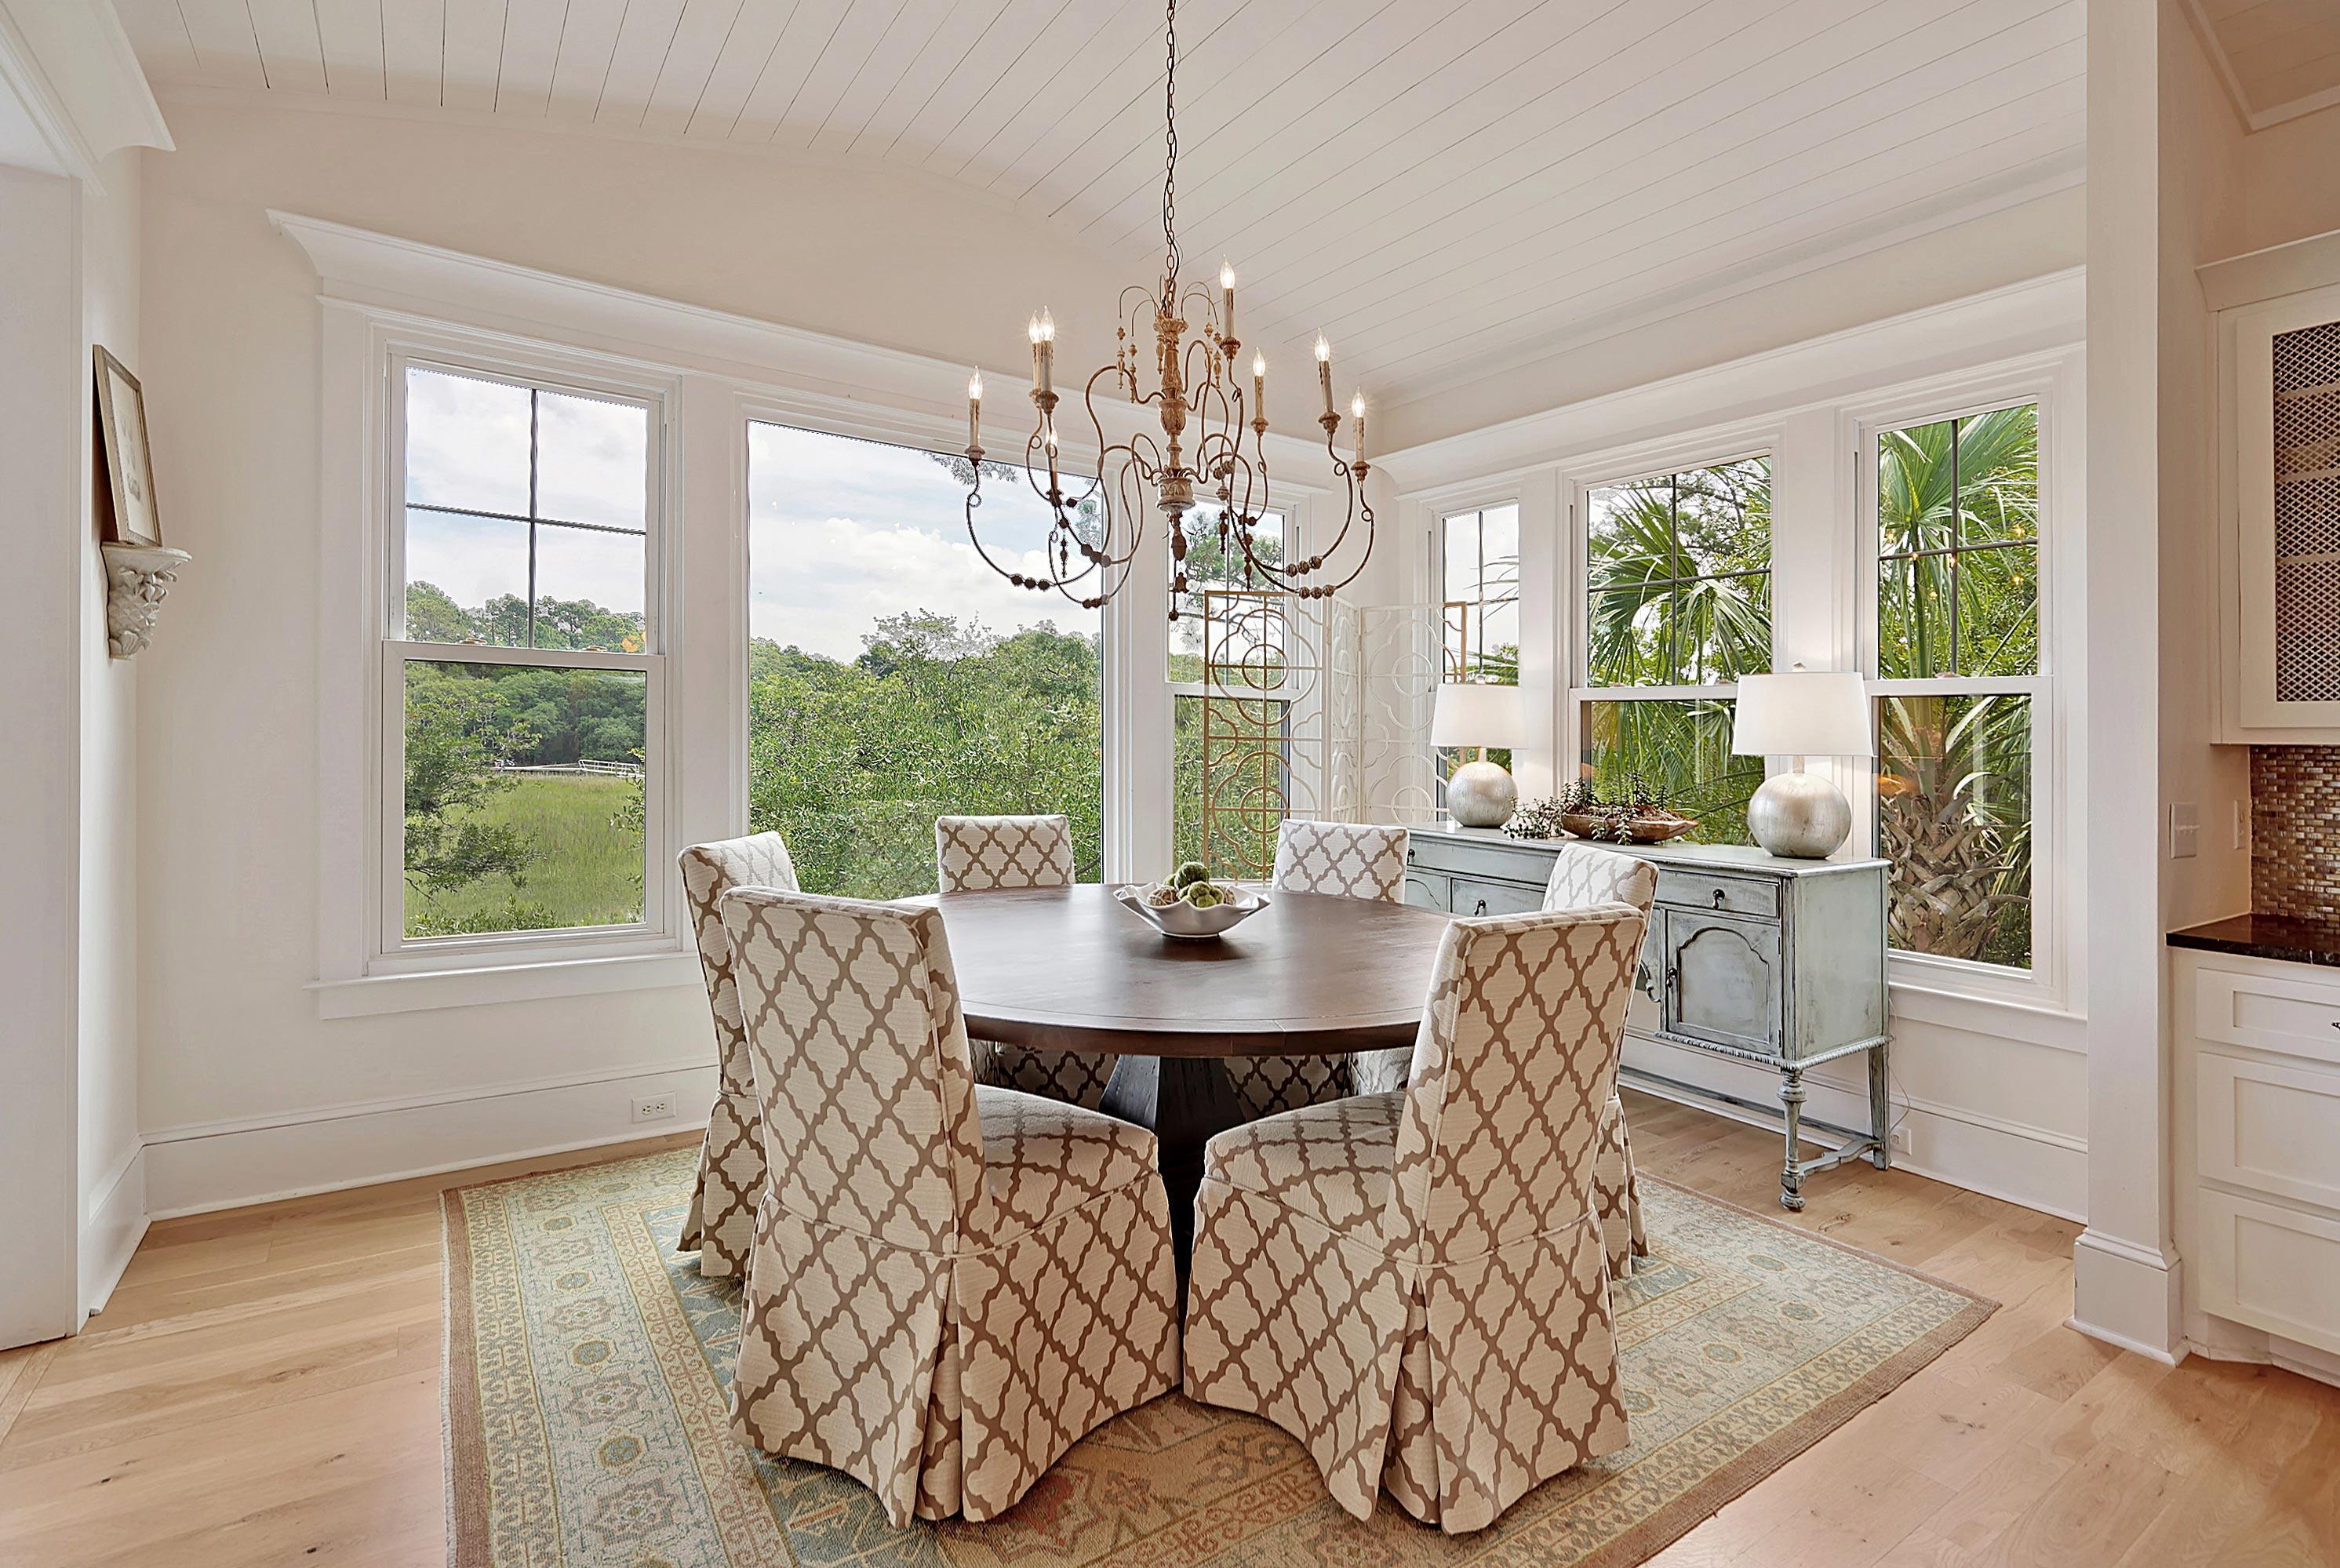 Grassy Creek Homes For Sale - 294 River Oak, Mount Pleasant, SC - 38